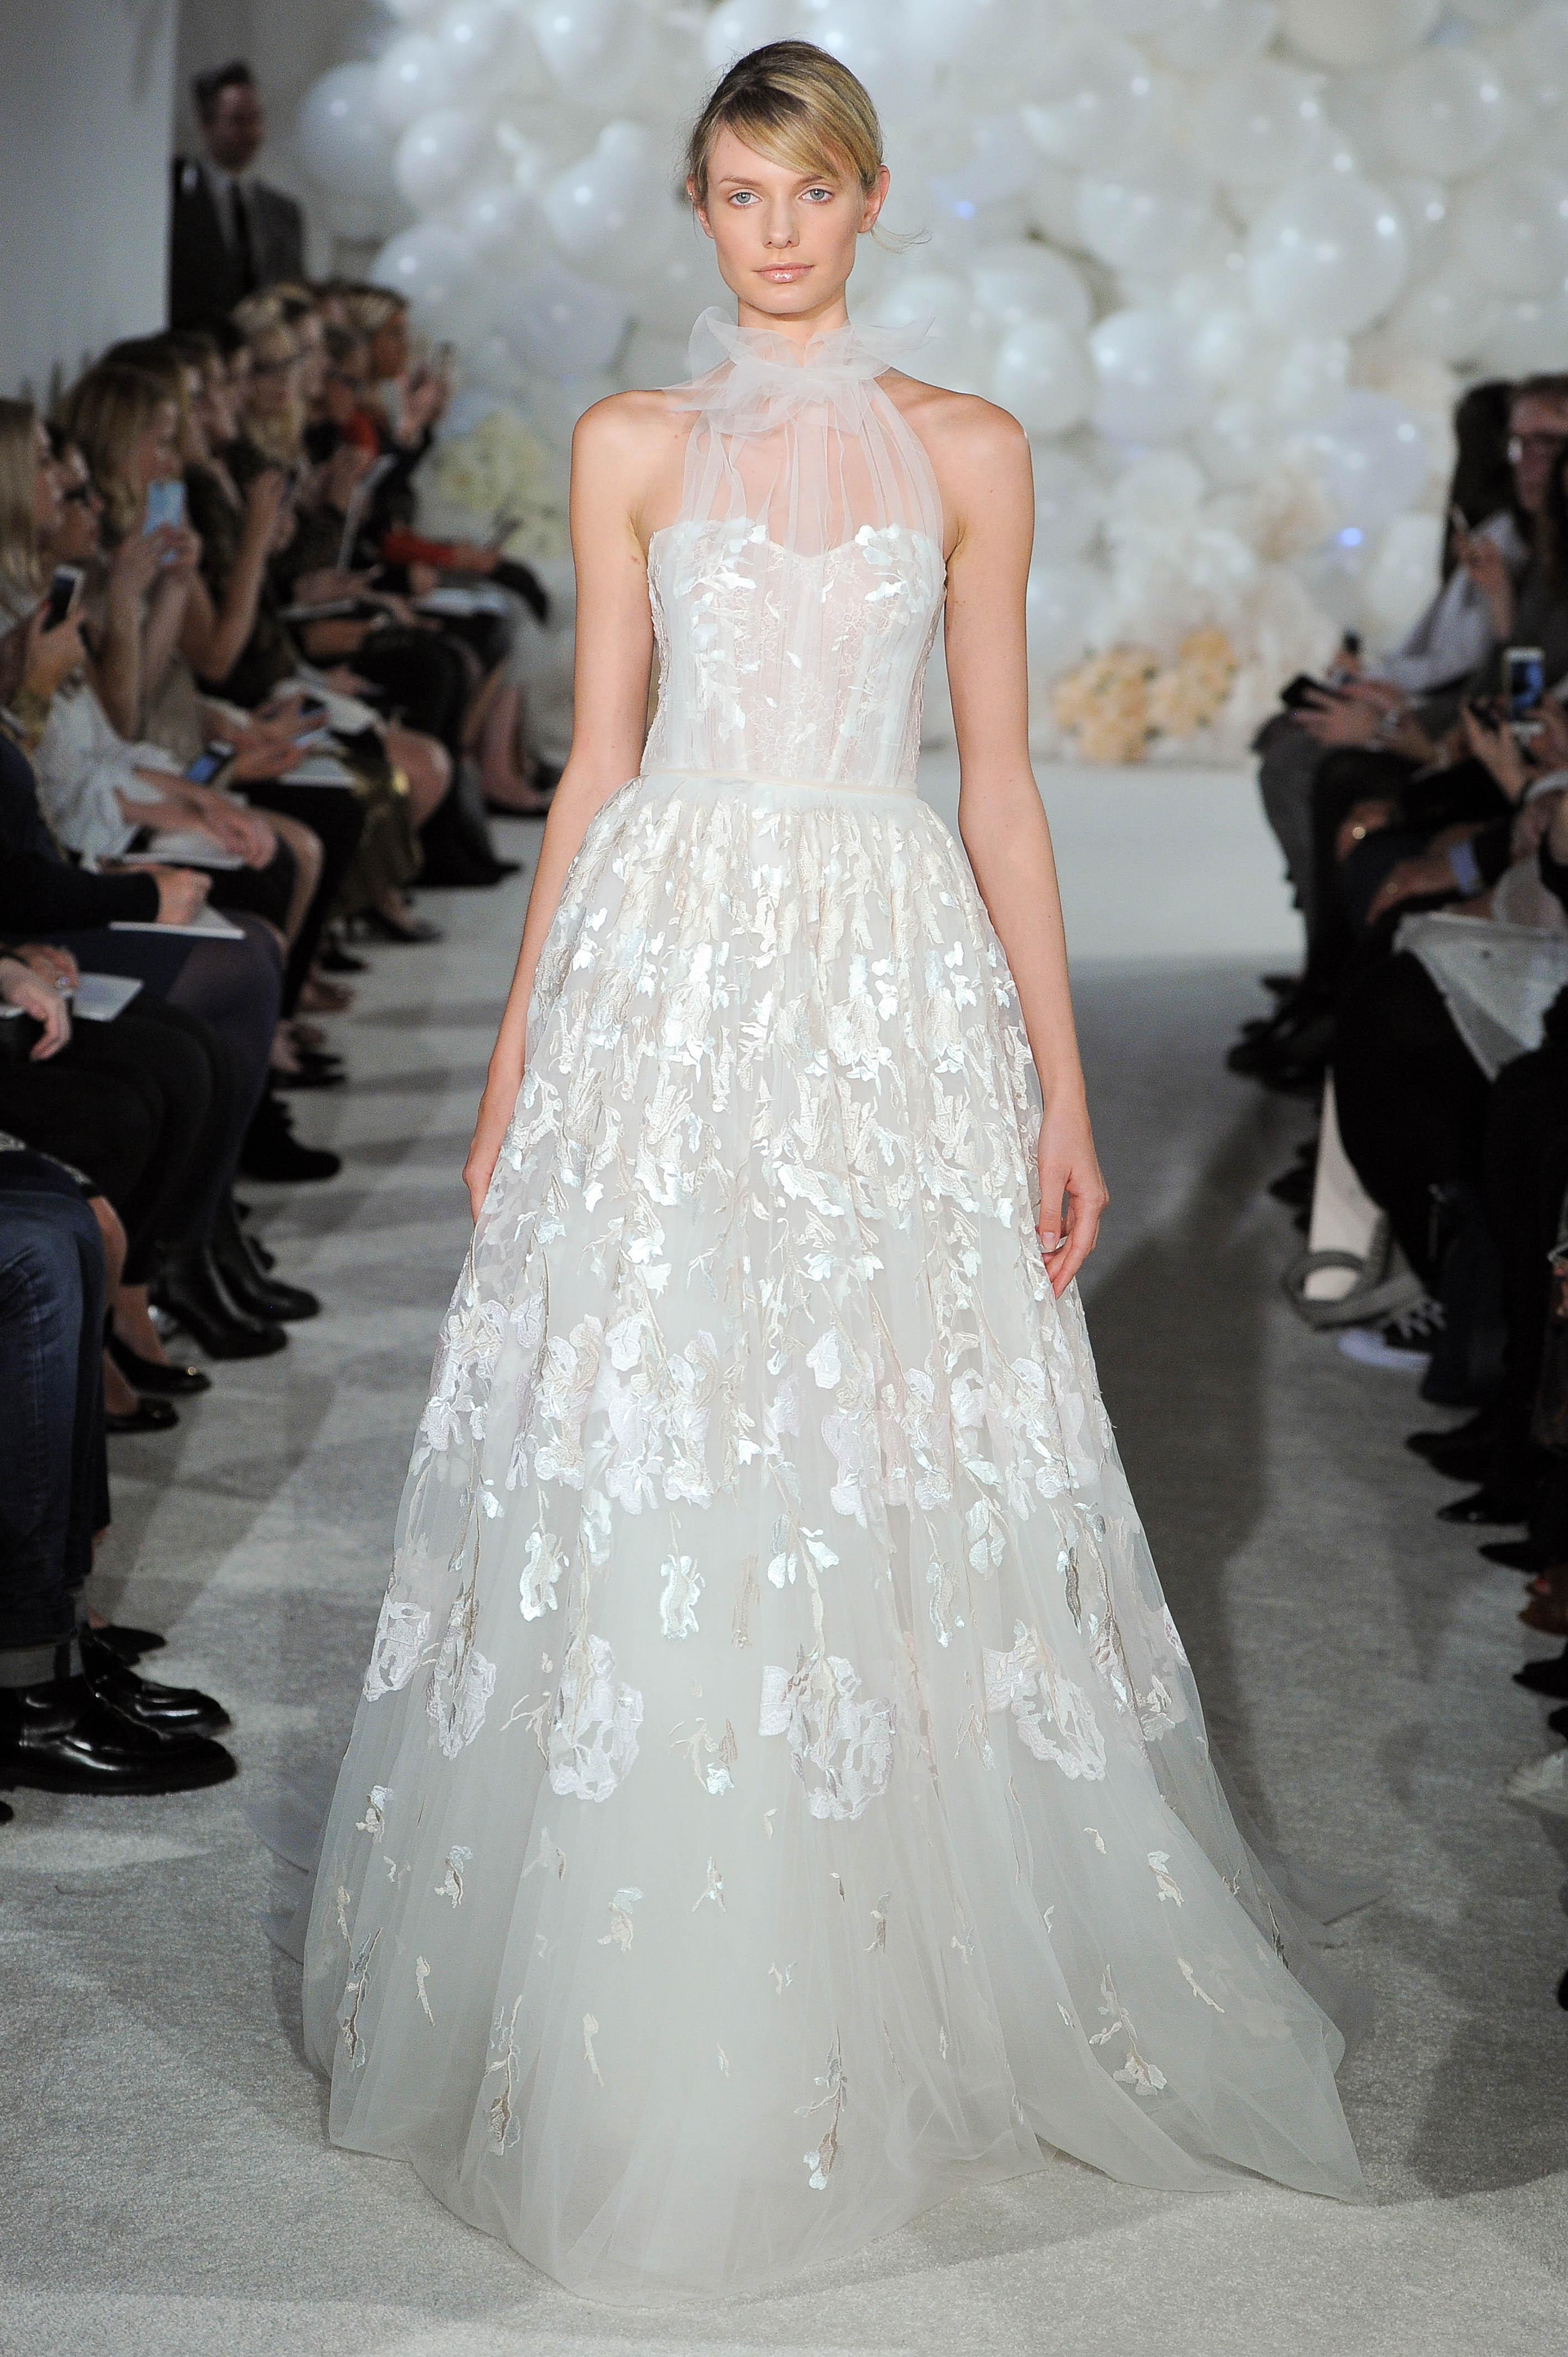 mira zwillinger wedding dress spring 2018 halter a-line